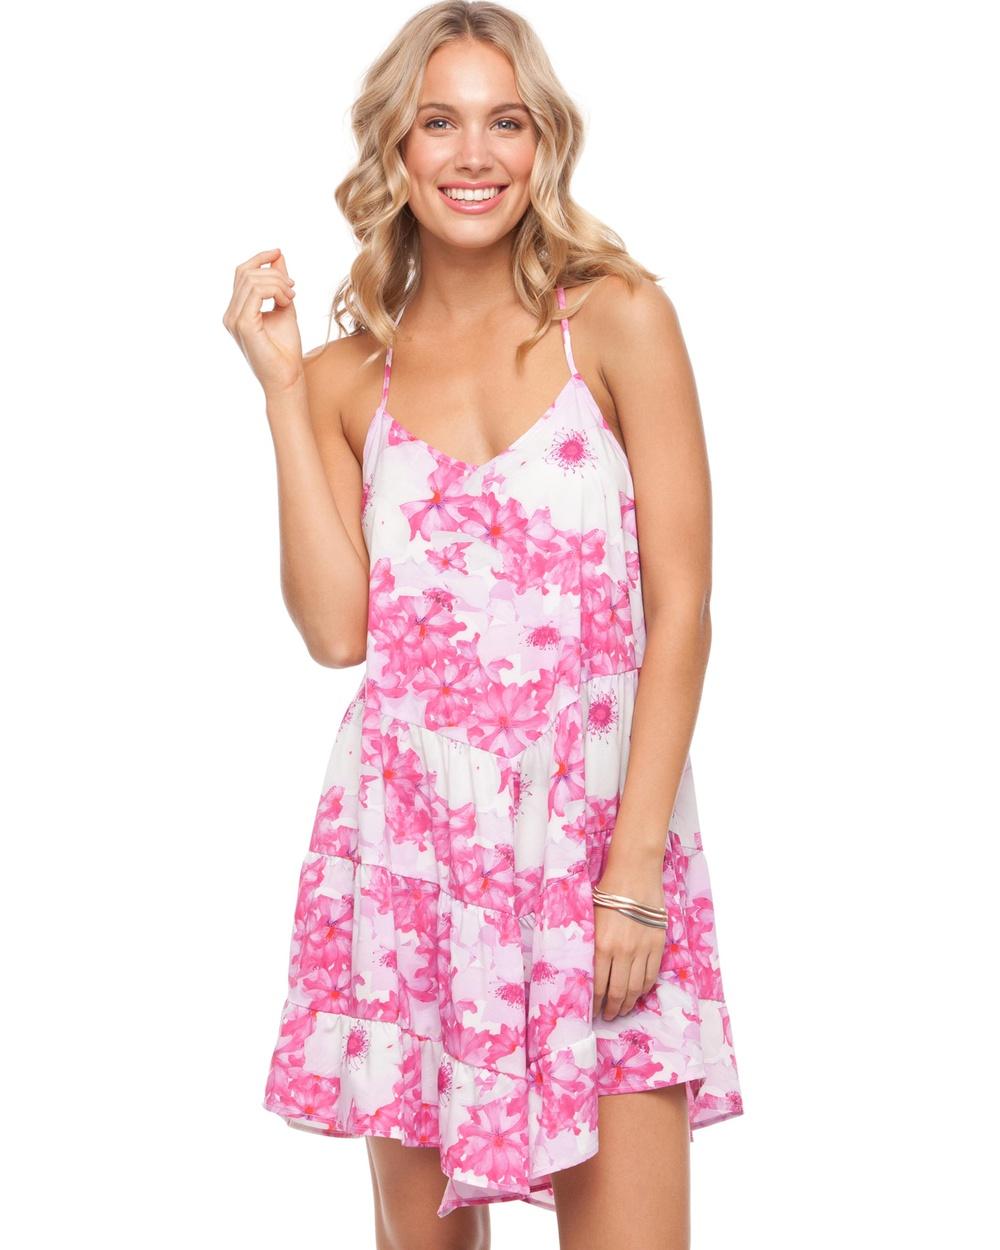 The-best-top-5-summer-dresses-2